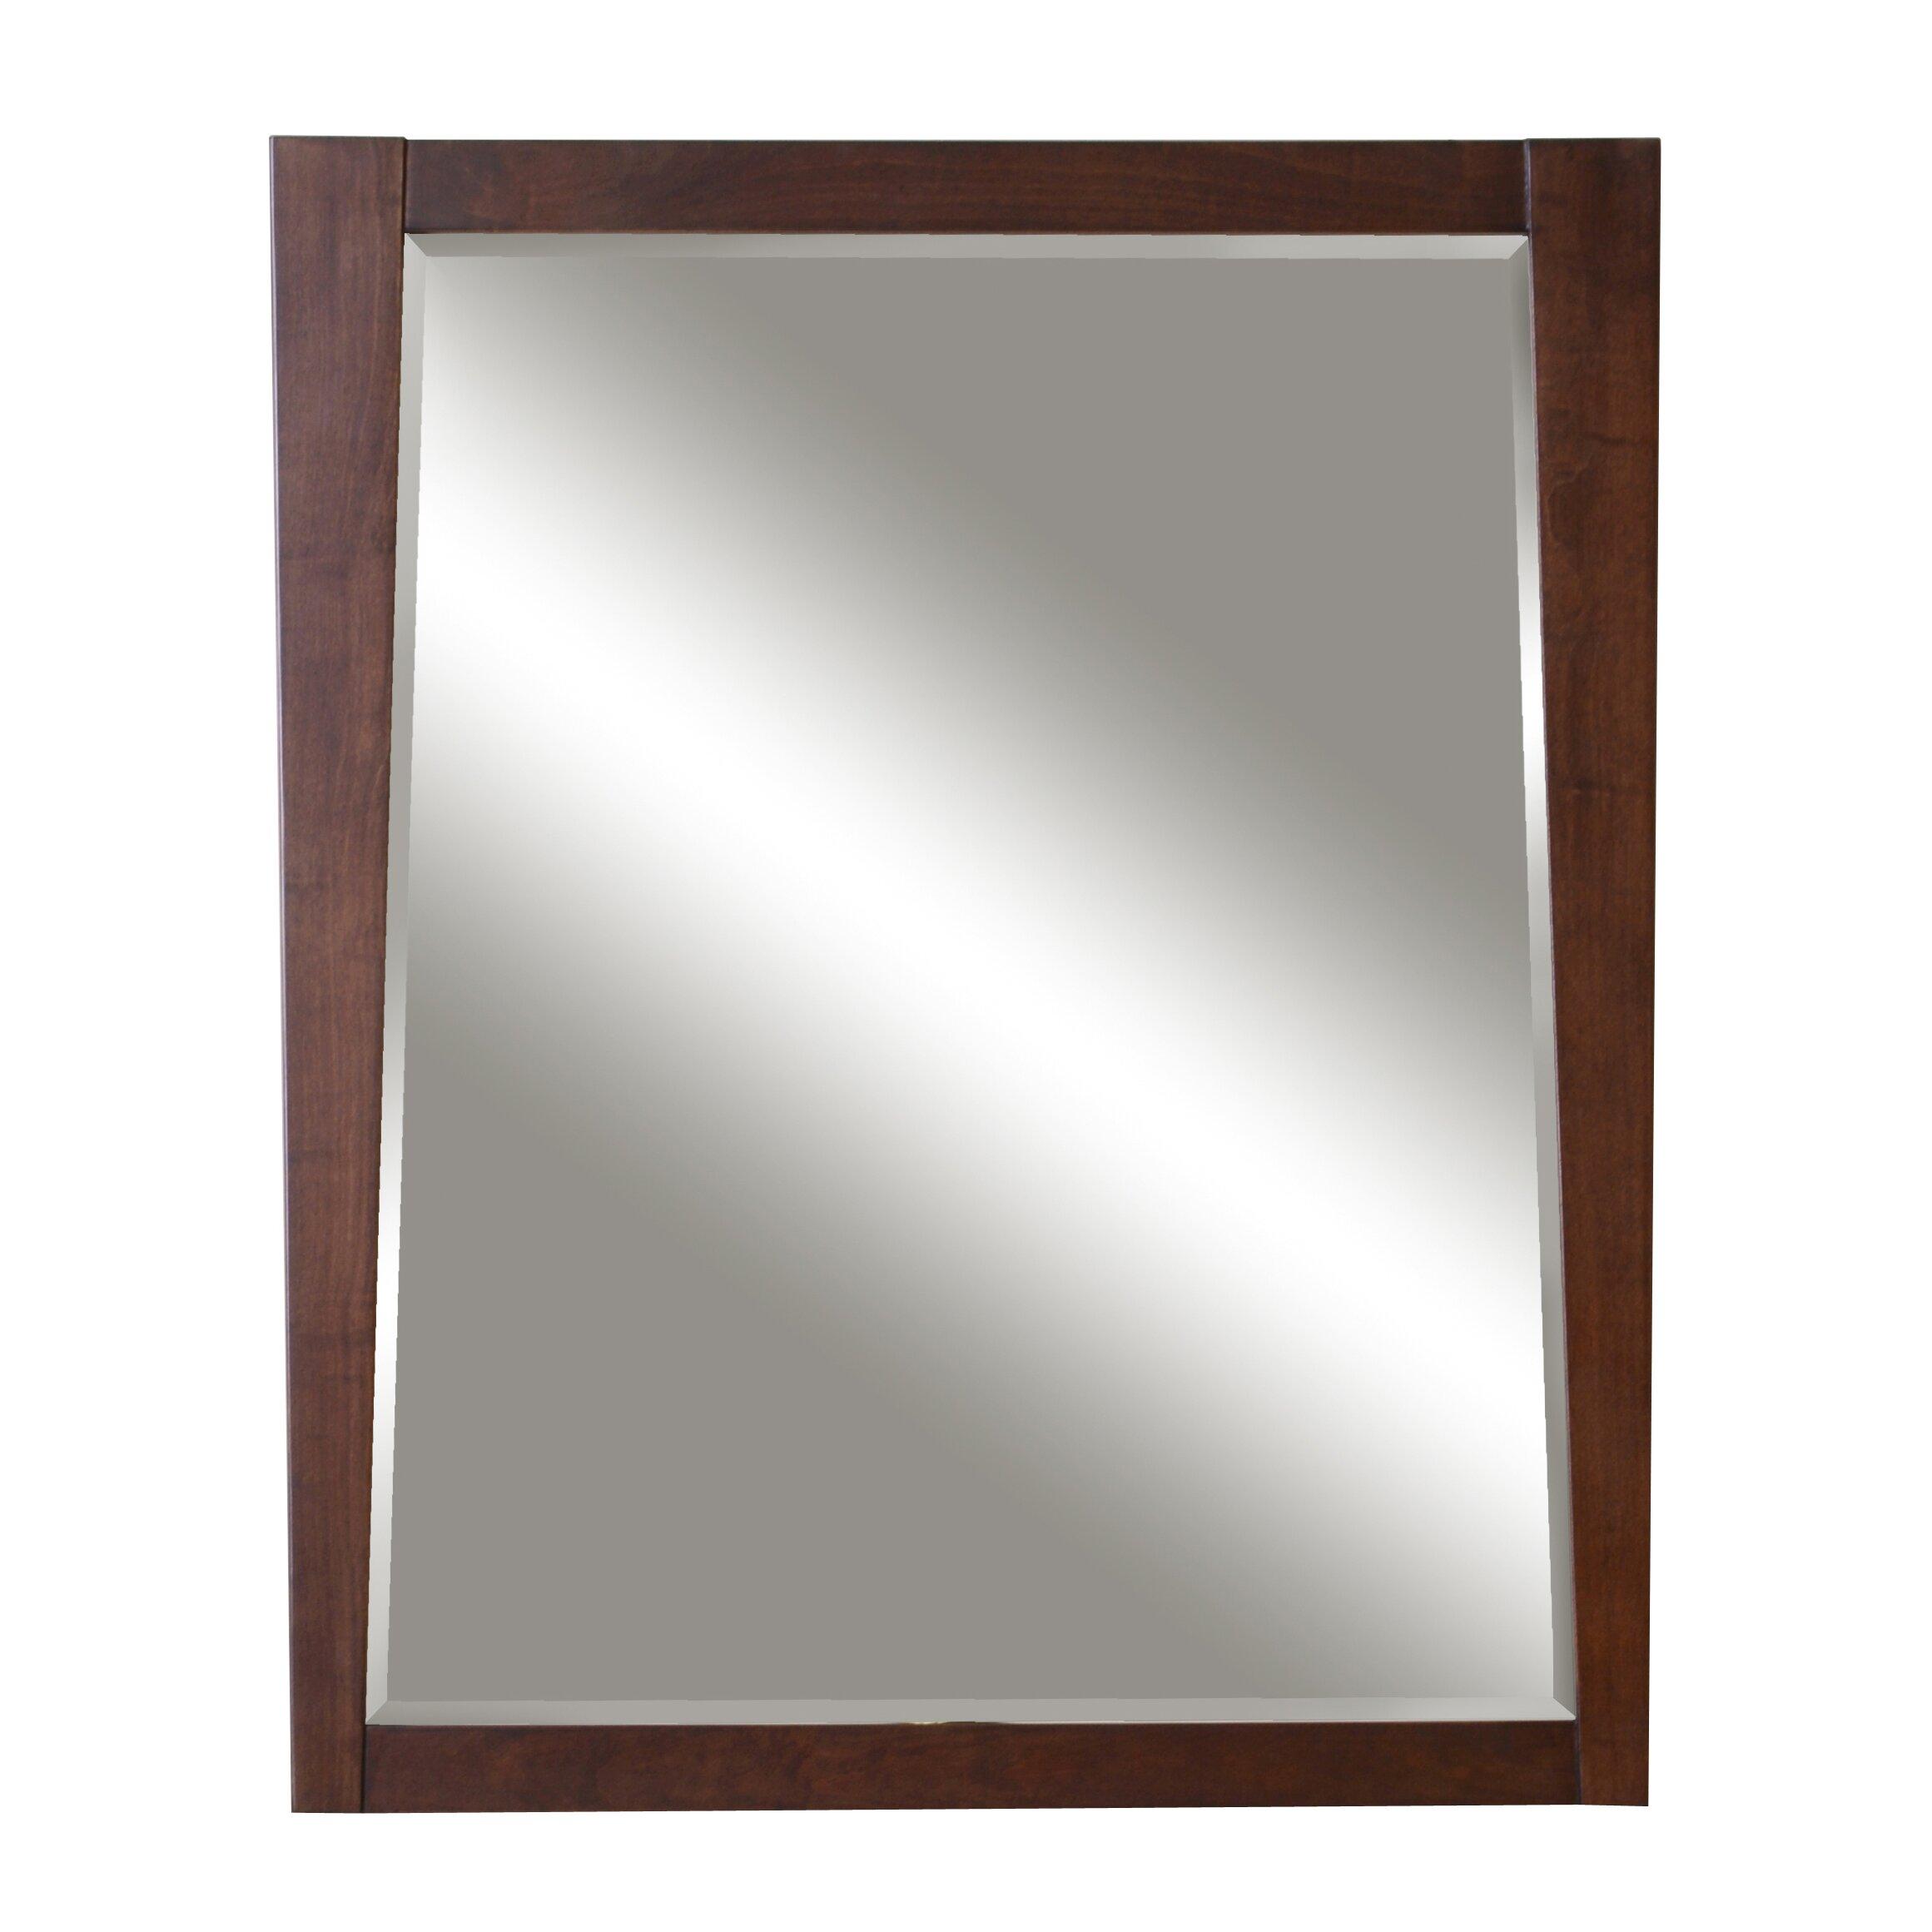 Jayden 30 x 36 framed mirror for Mirror 30 x 36